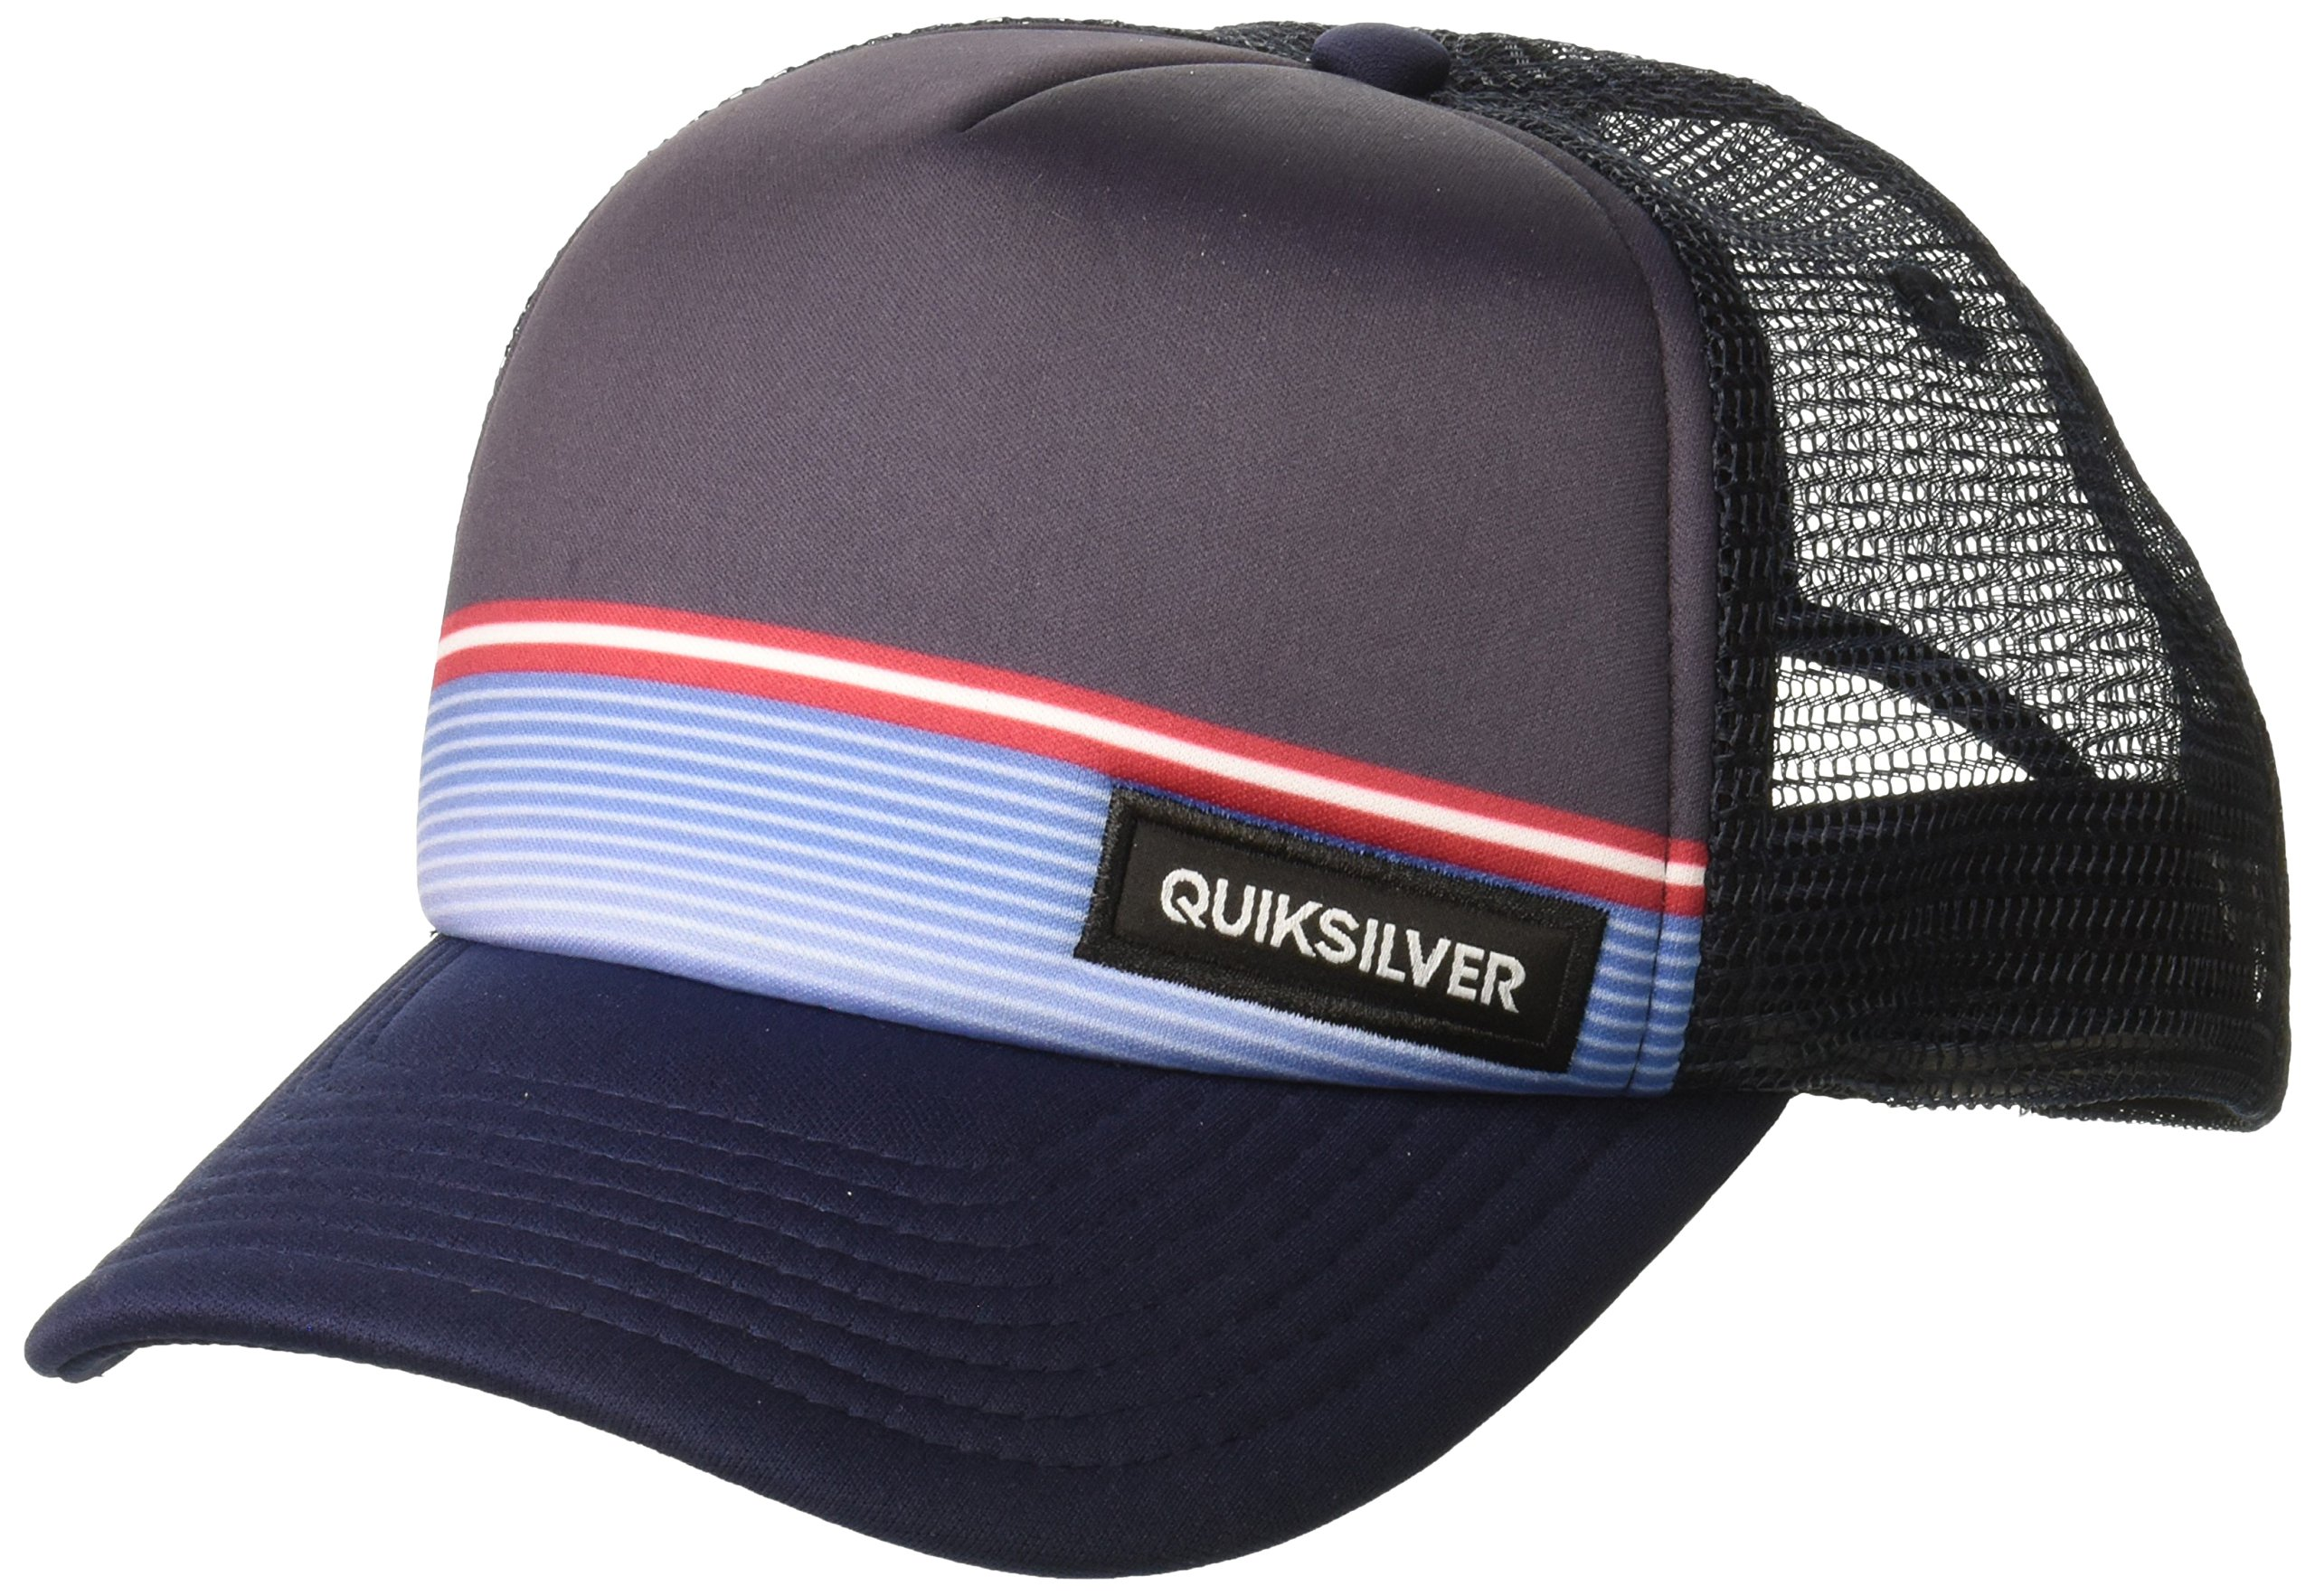 Quiksilver Men's Stripe Stare Hat, Navy Blazer, 1SZ